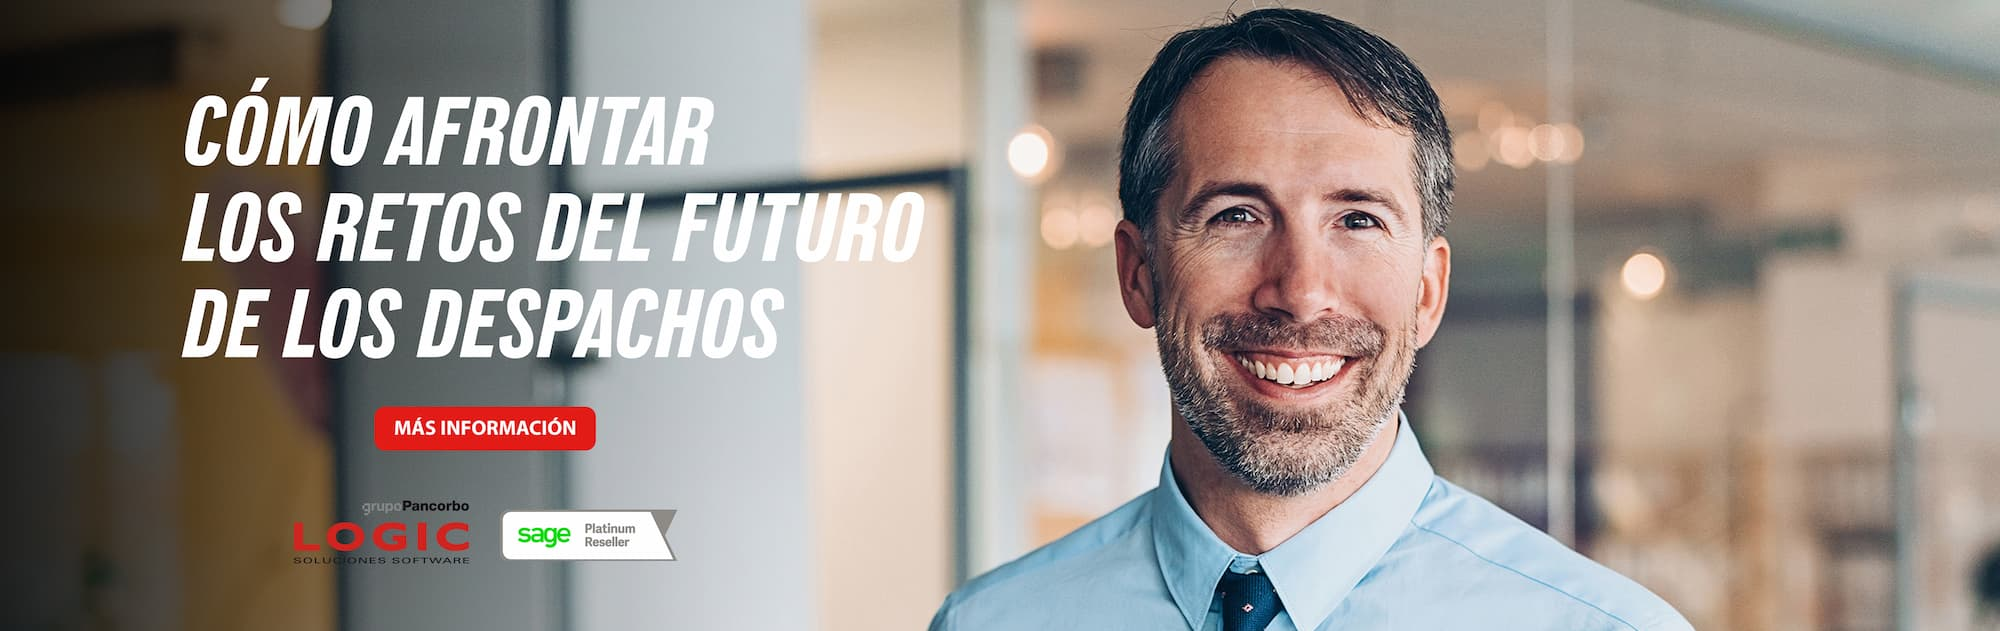 202006 bannerWEB despachos futuro - Inicio